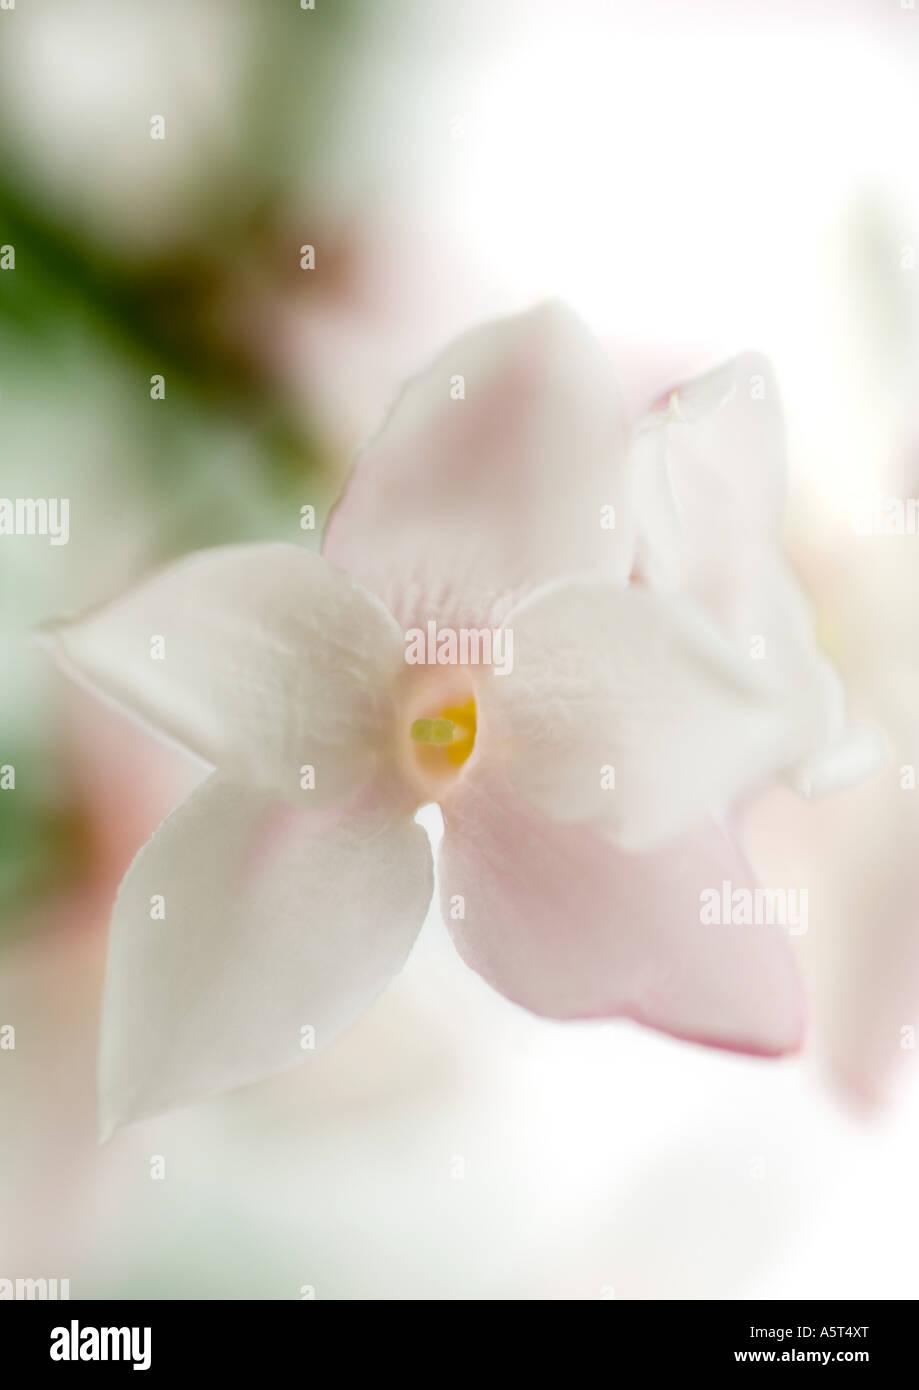 Jasmine blossom, close-up - Stock Image